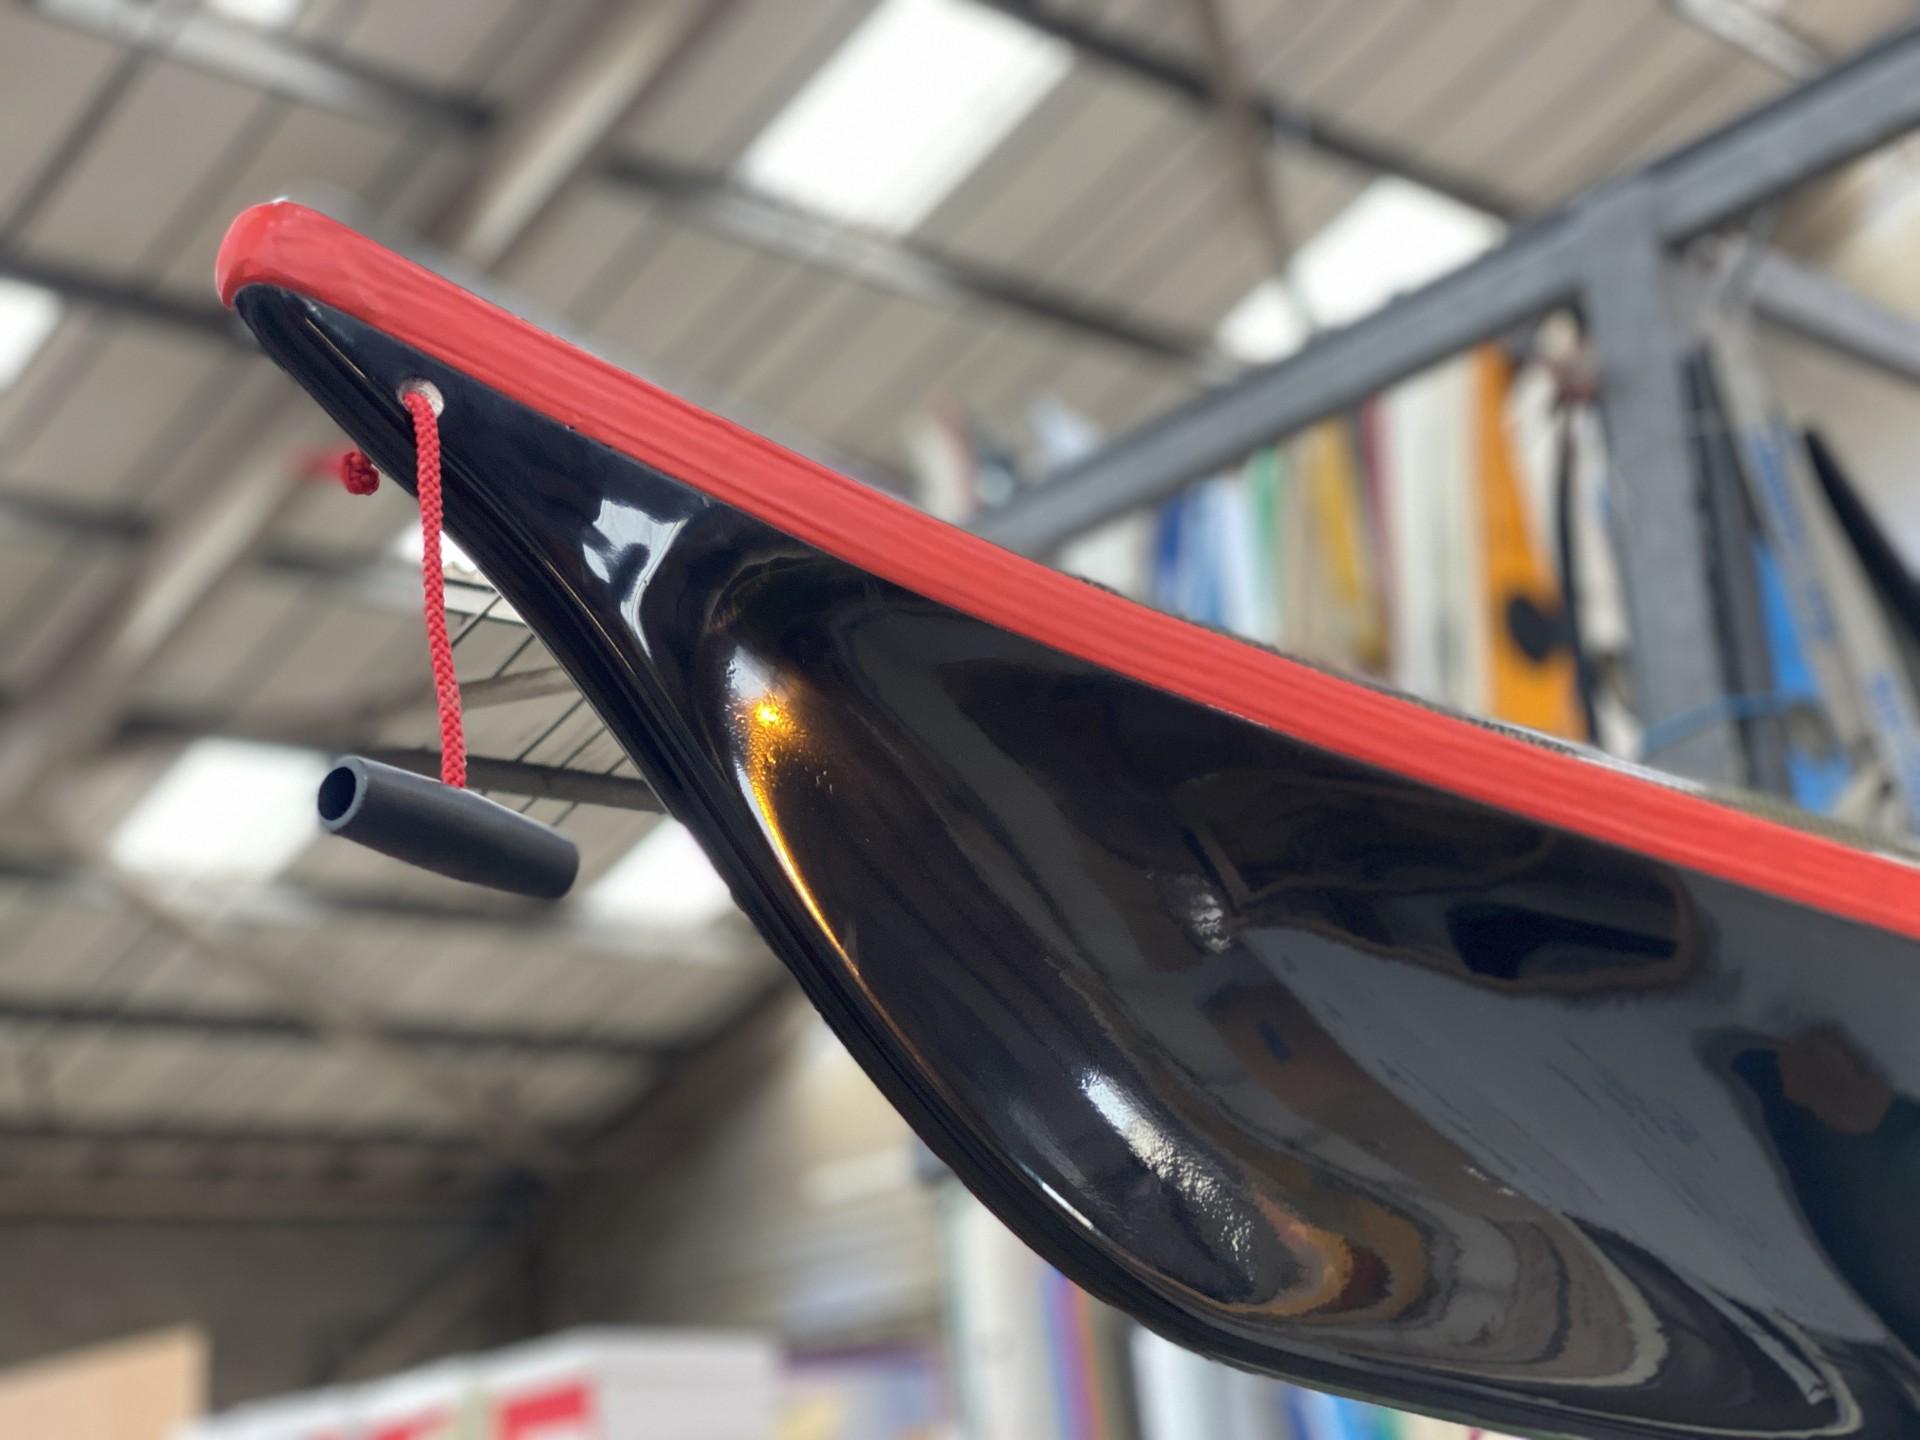 NDK Explorer sea kayak black composite with red trim